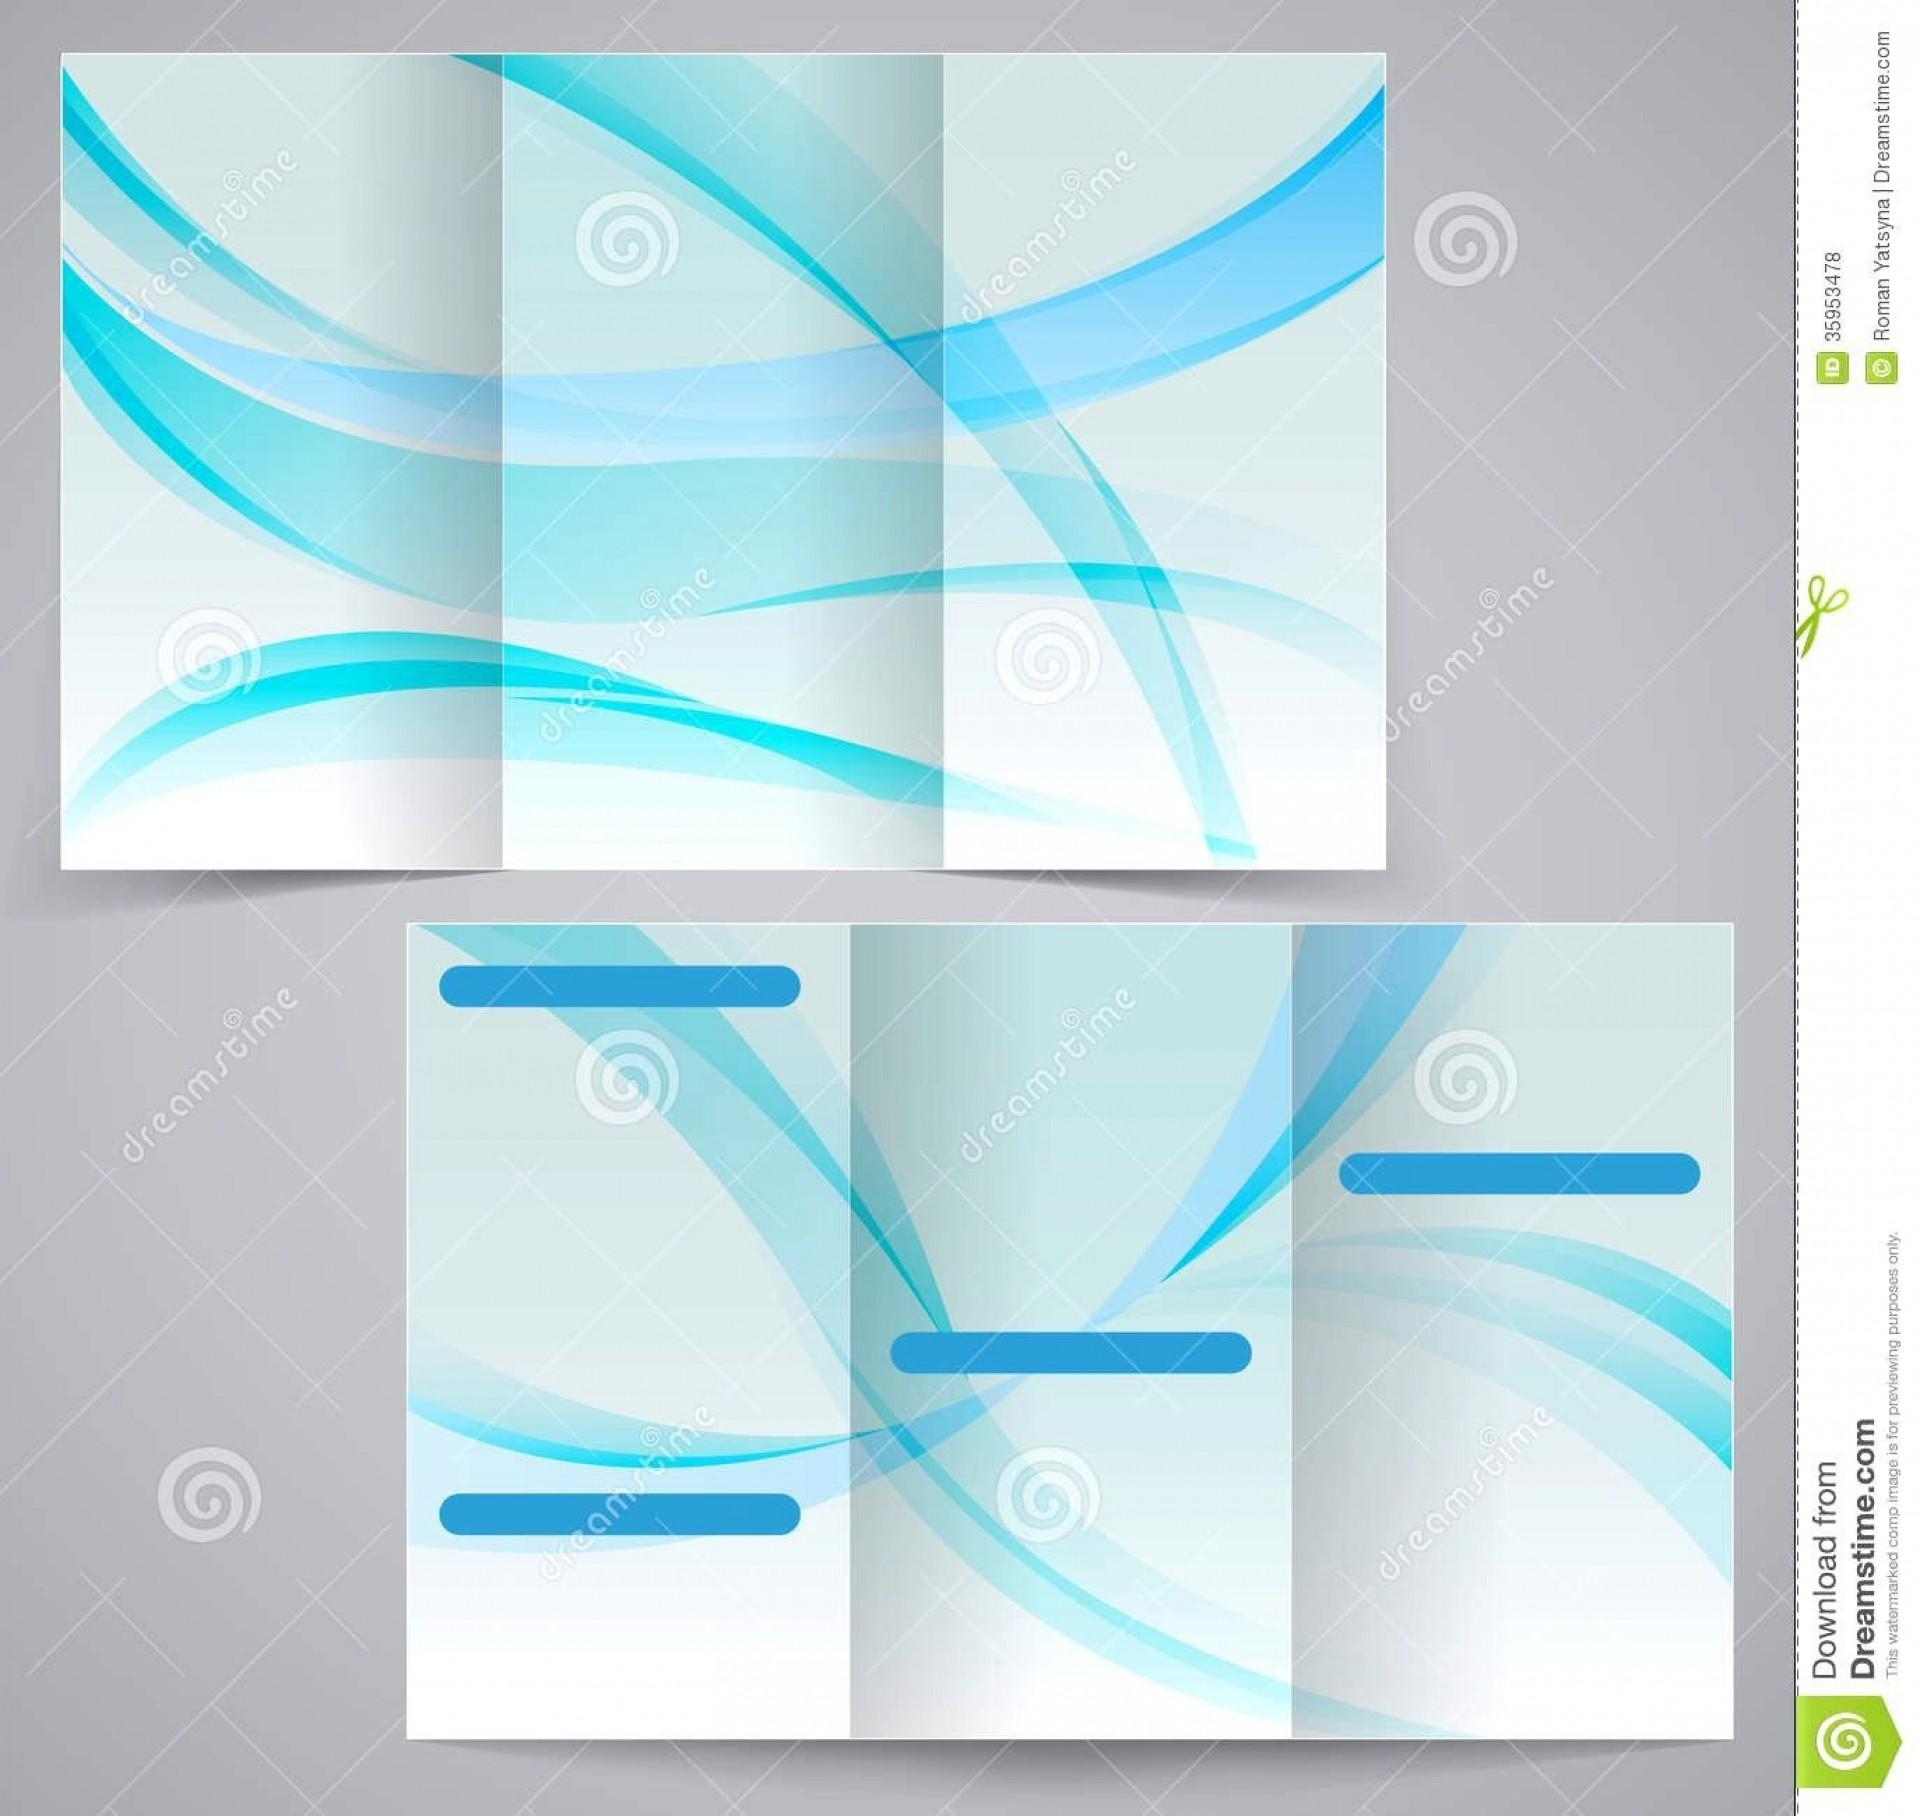 000 Stunning M Word Travel Brochure Template Highest Clarity  Microsoft Free1920